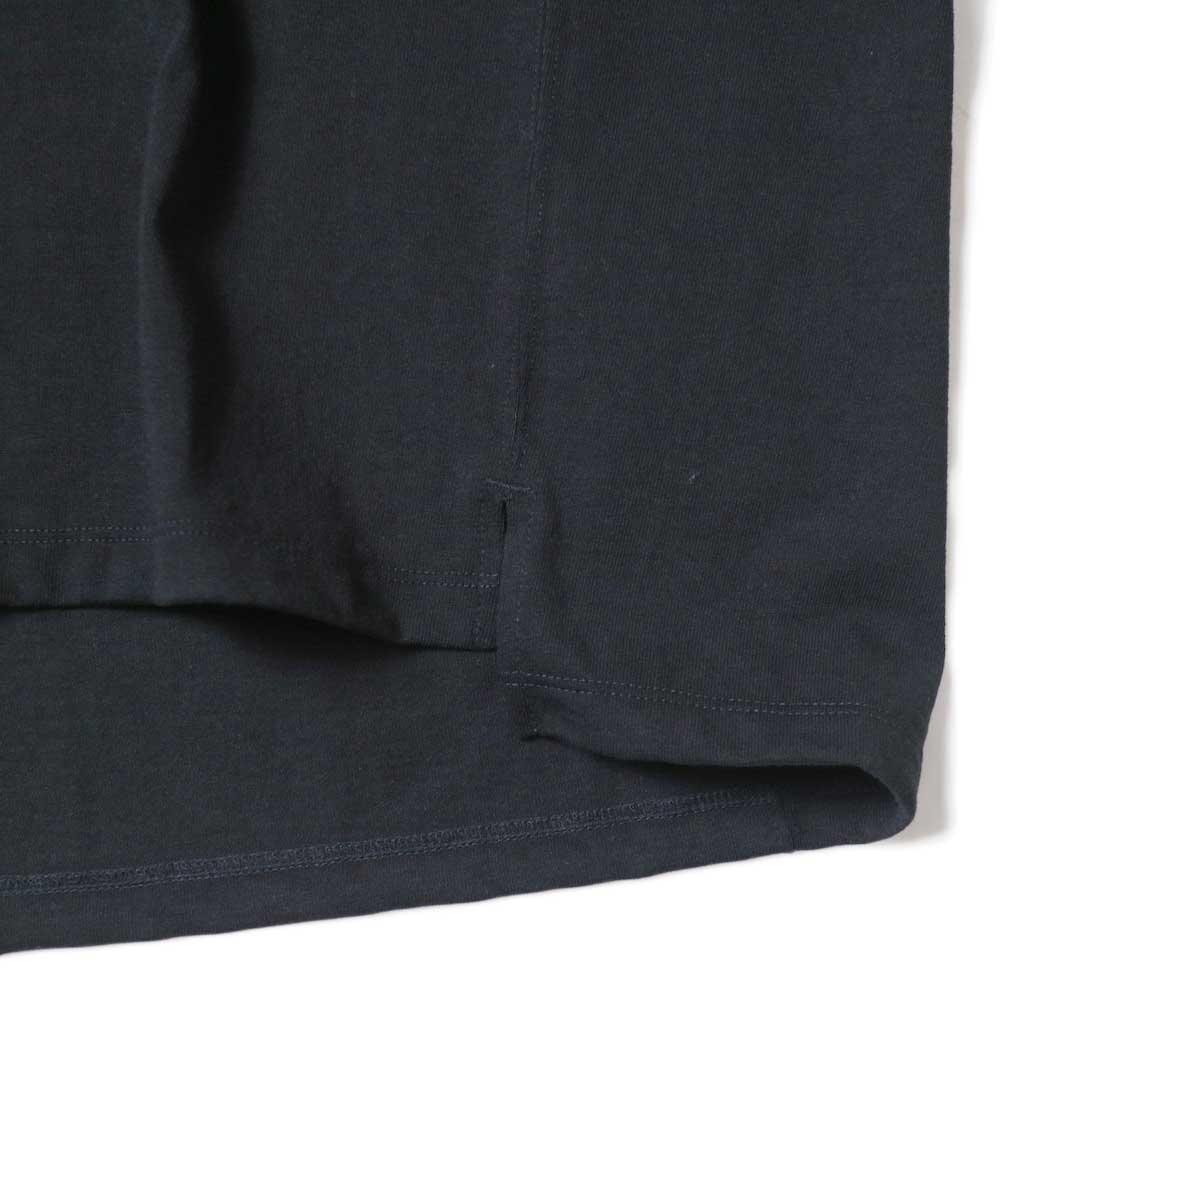 alvana / Protect Football S/S Tee (Black)裾